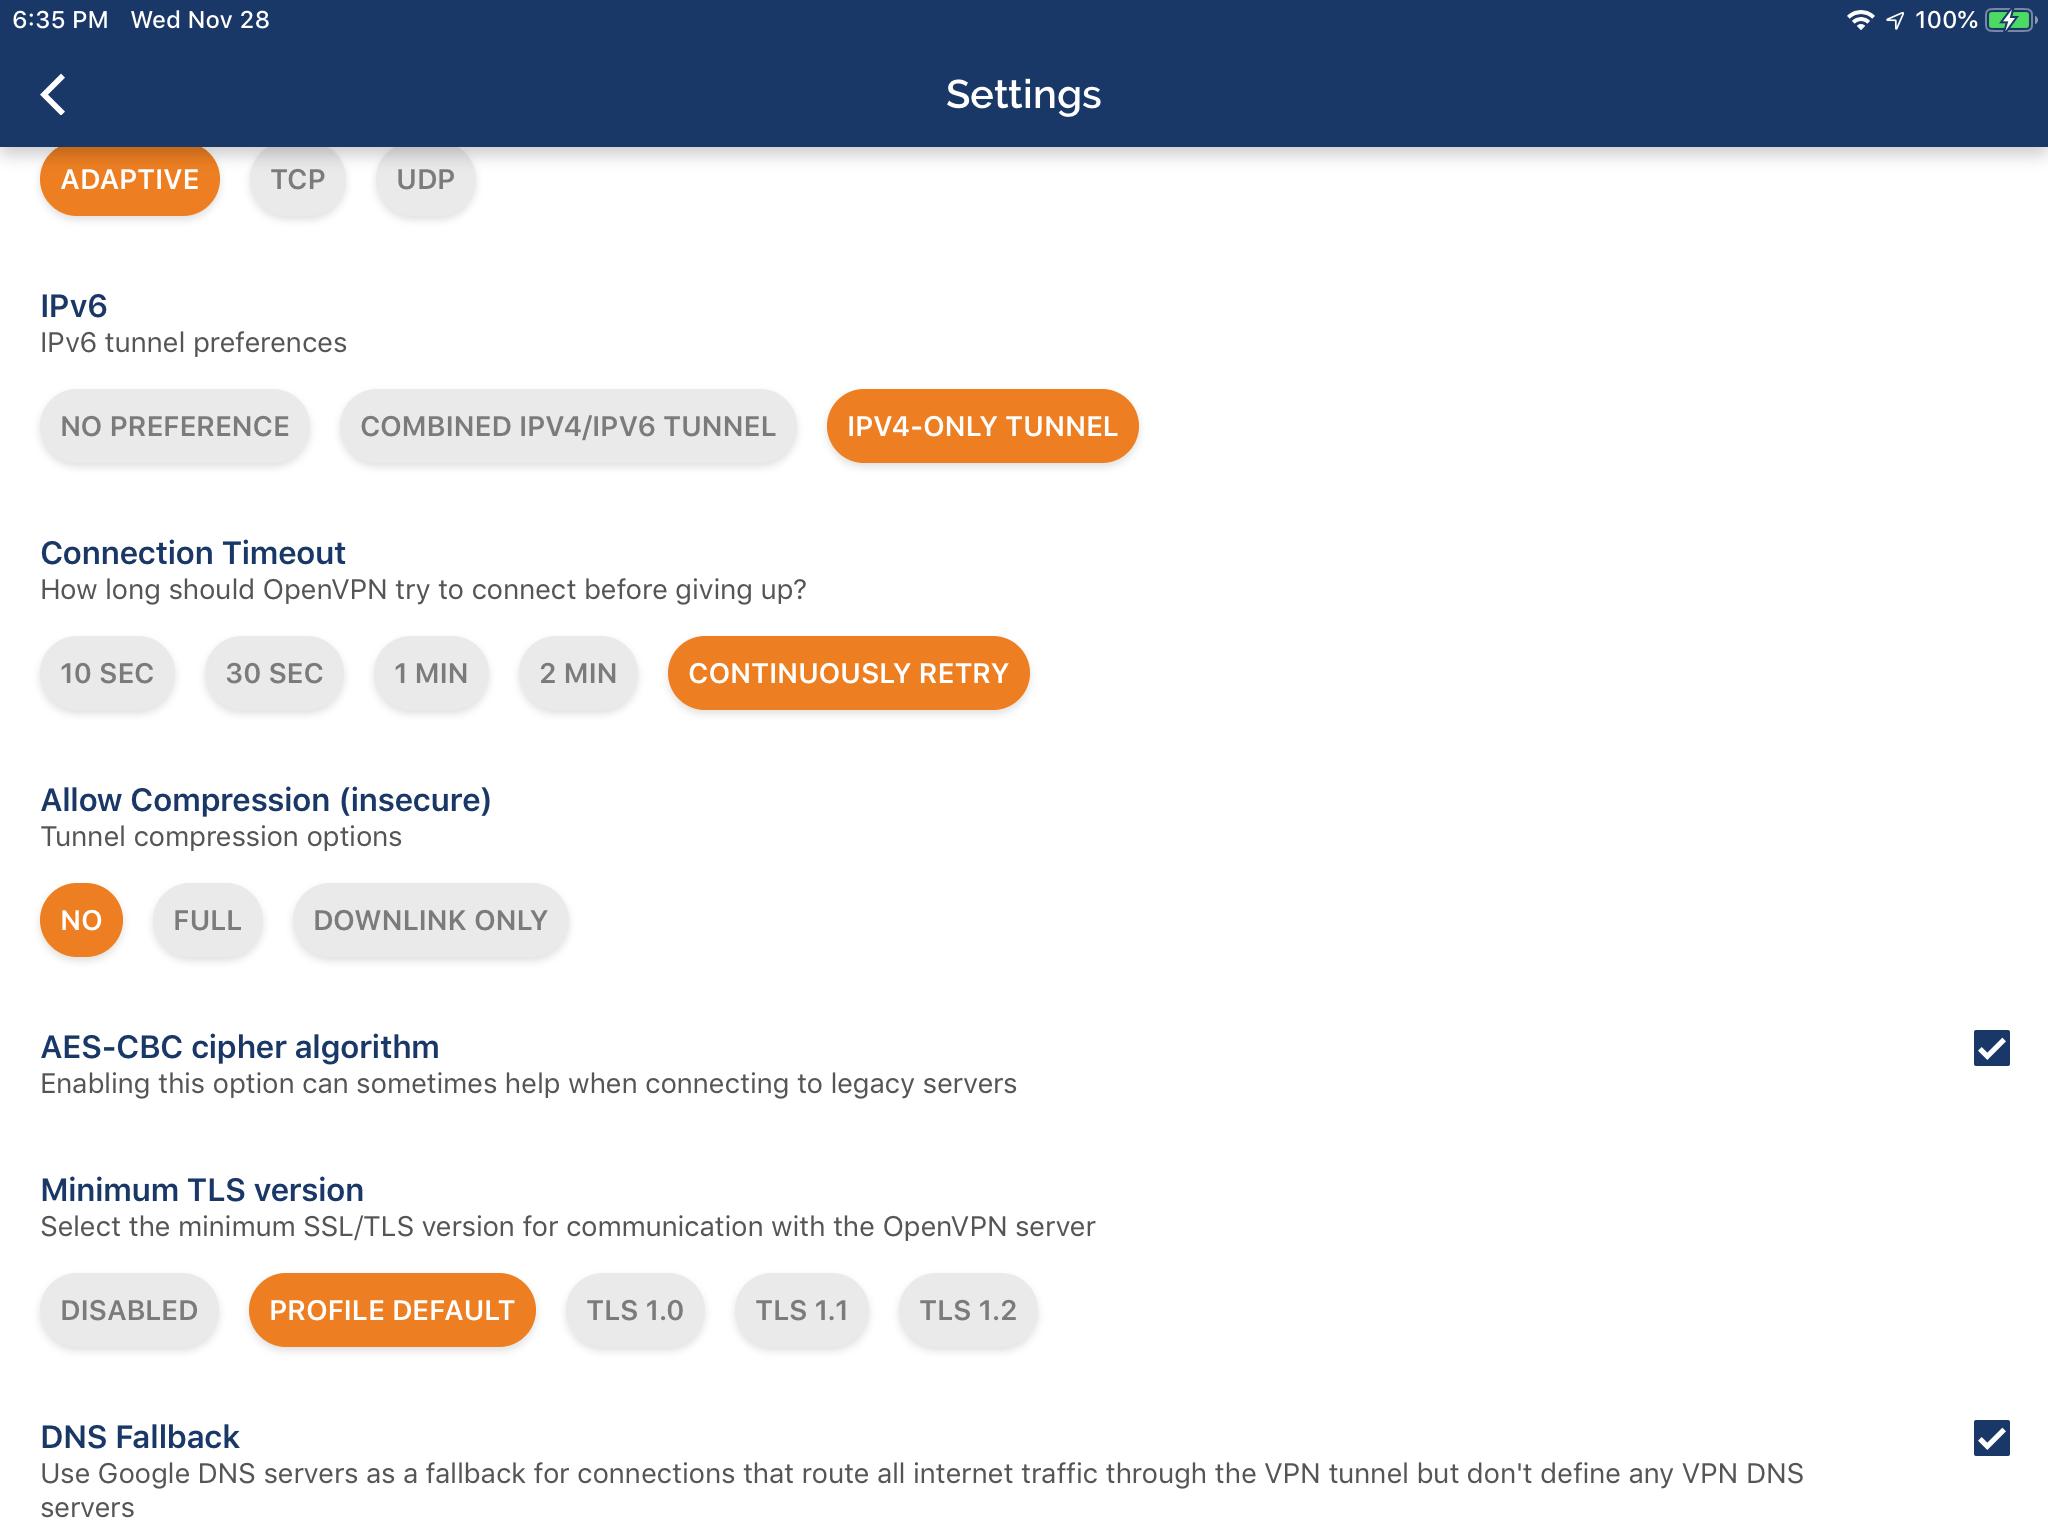 OpenVPN on IOS 12 x fails to Connect to PiVPN | Wondernerd net